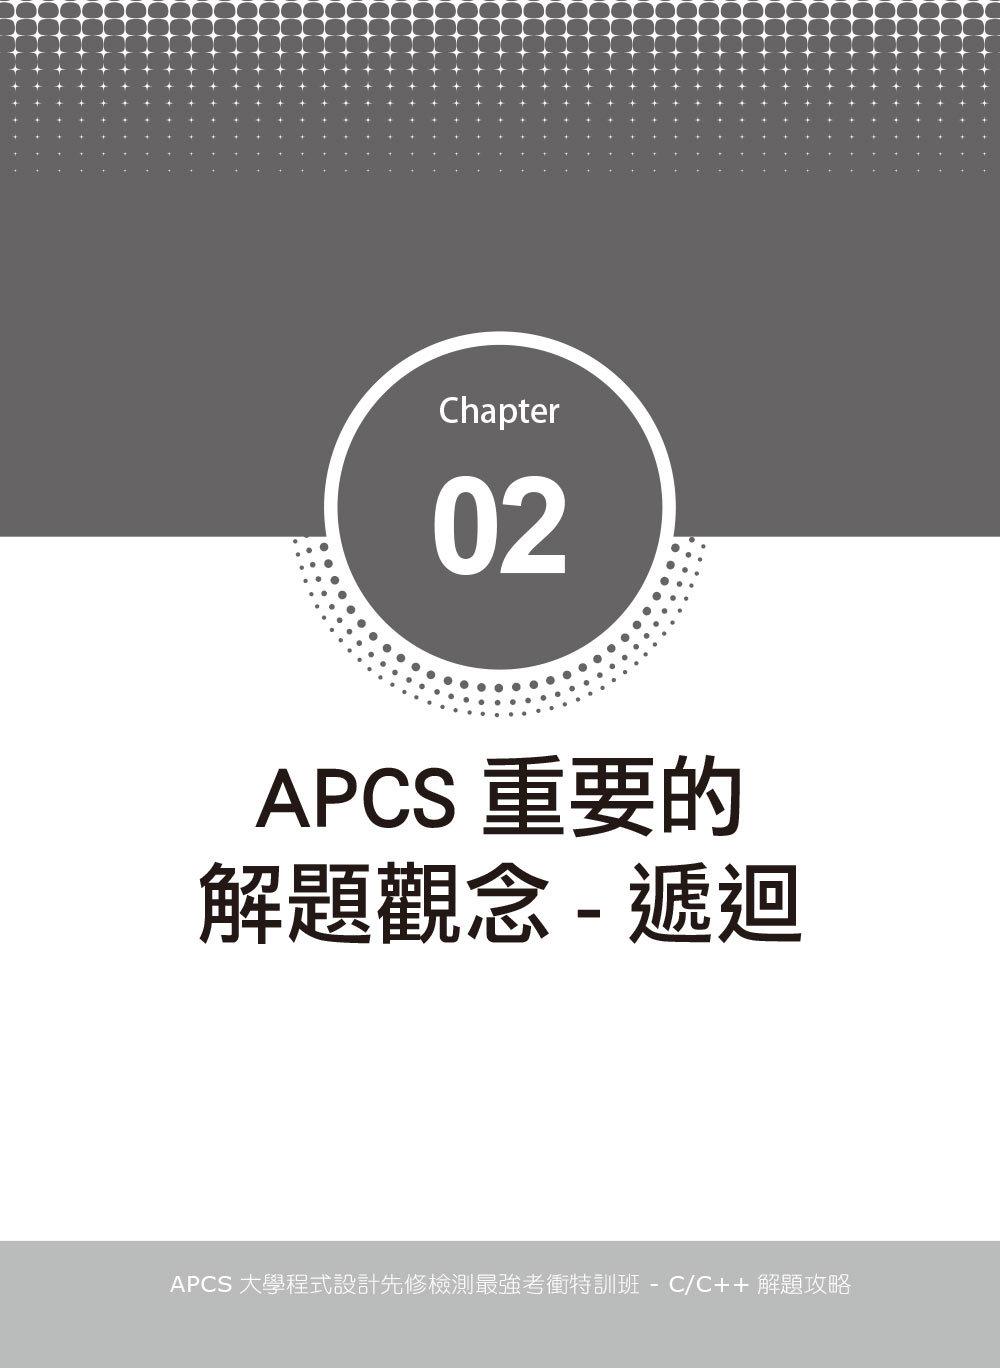 APCS 大學程式設計先修檢測最強考衝特訓班 -- C/C++ 解題攻略-preview-1